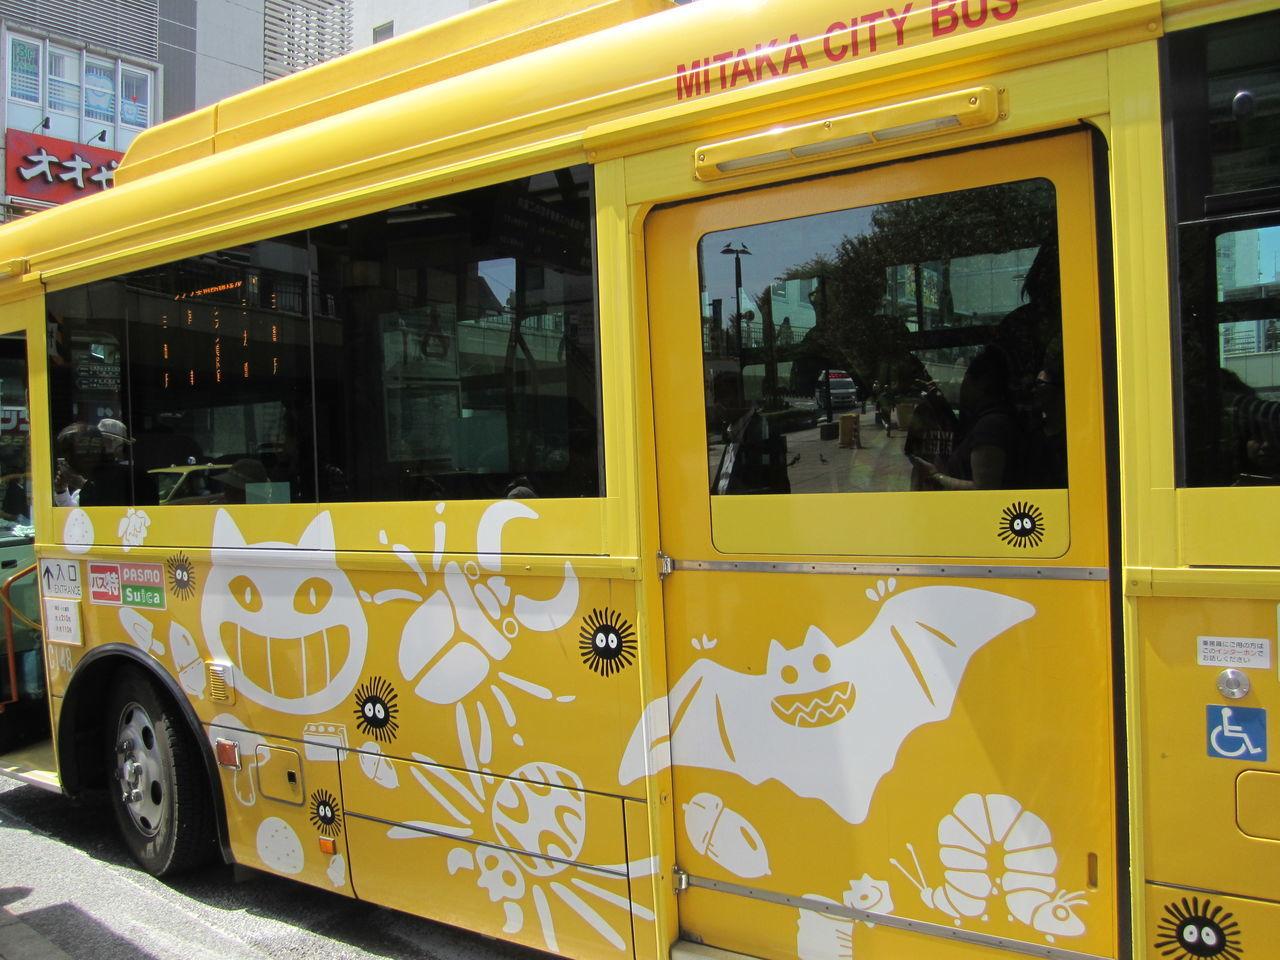 Bus City Bus Day Japan Land Vehicle Mode Of Transport Outdoors Public Transportation Transportation Traveling Window Yellow